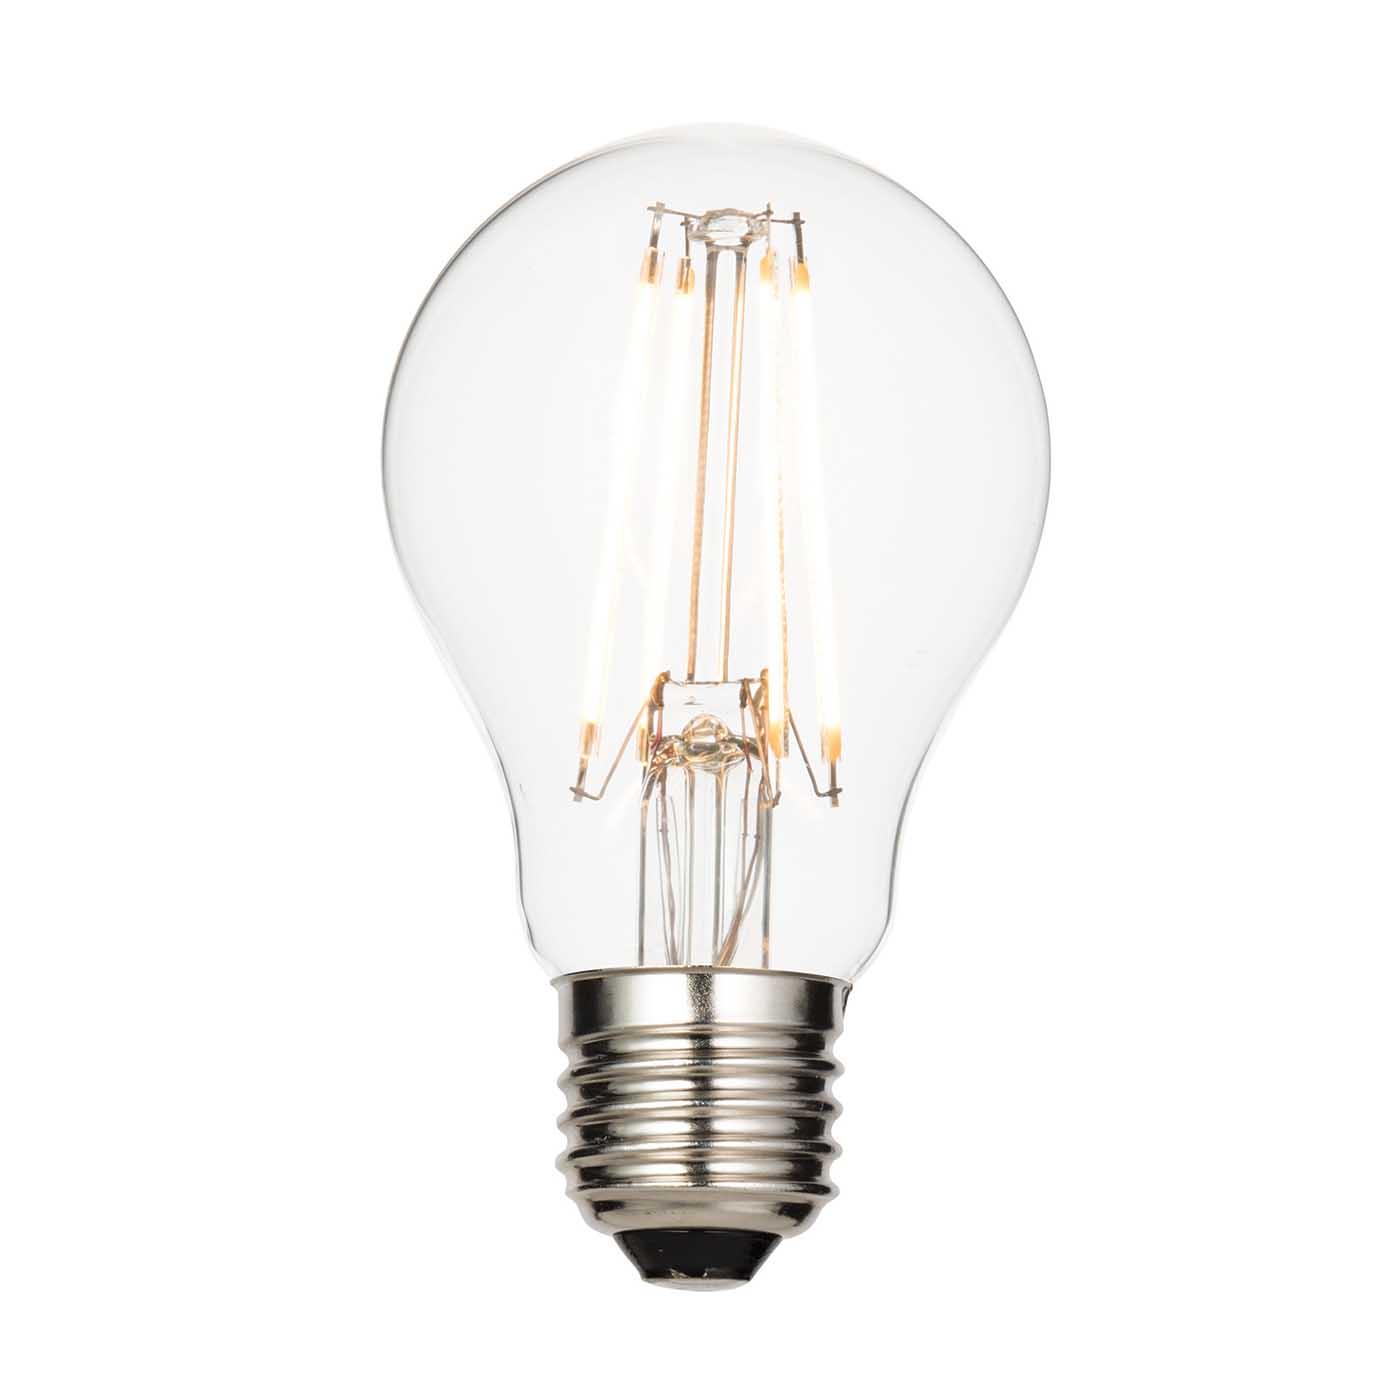 Saxby E27 Led Light Bulb Filament Gls 6 2w Warm White